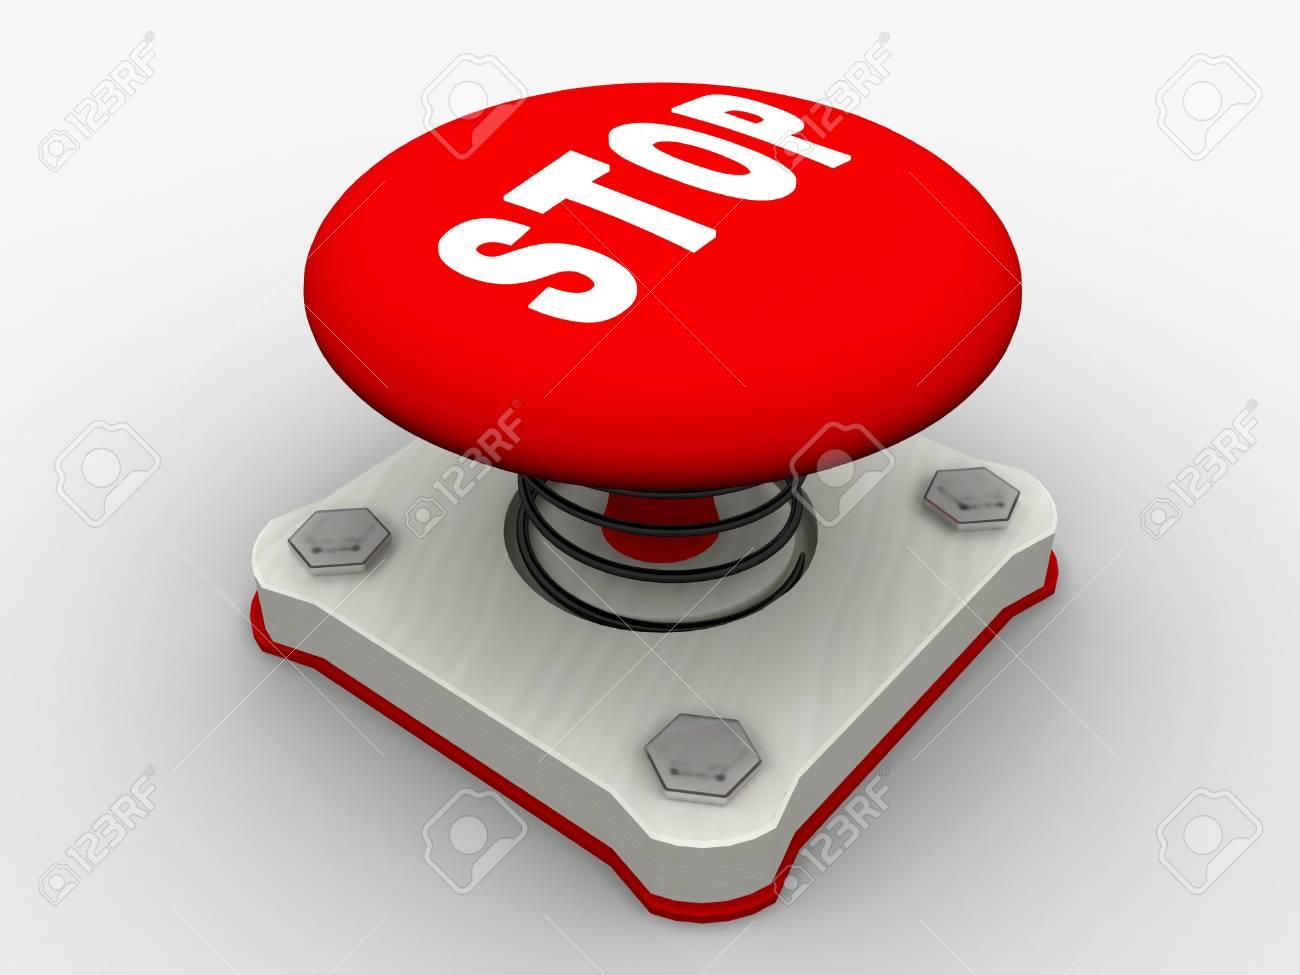 Red start button on a metal platform Stock Photo - 5424060